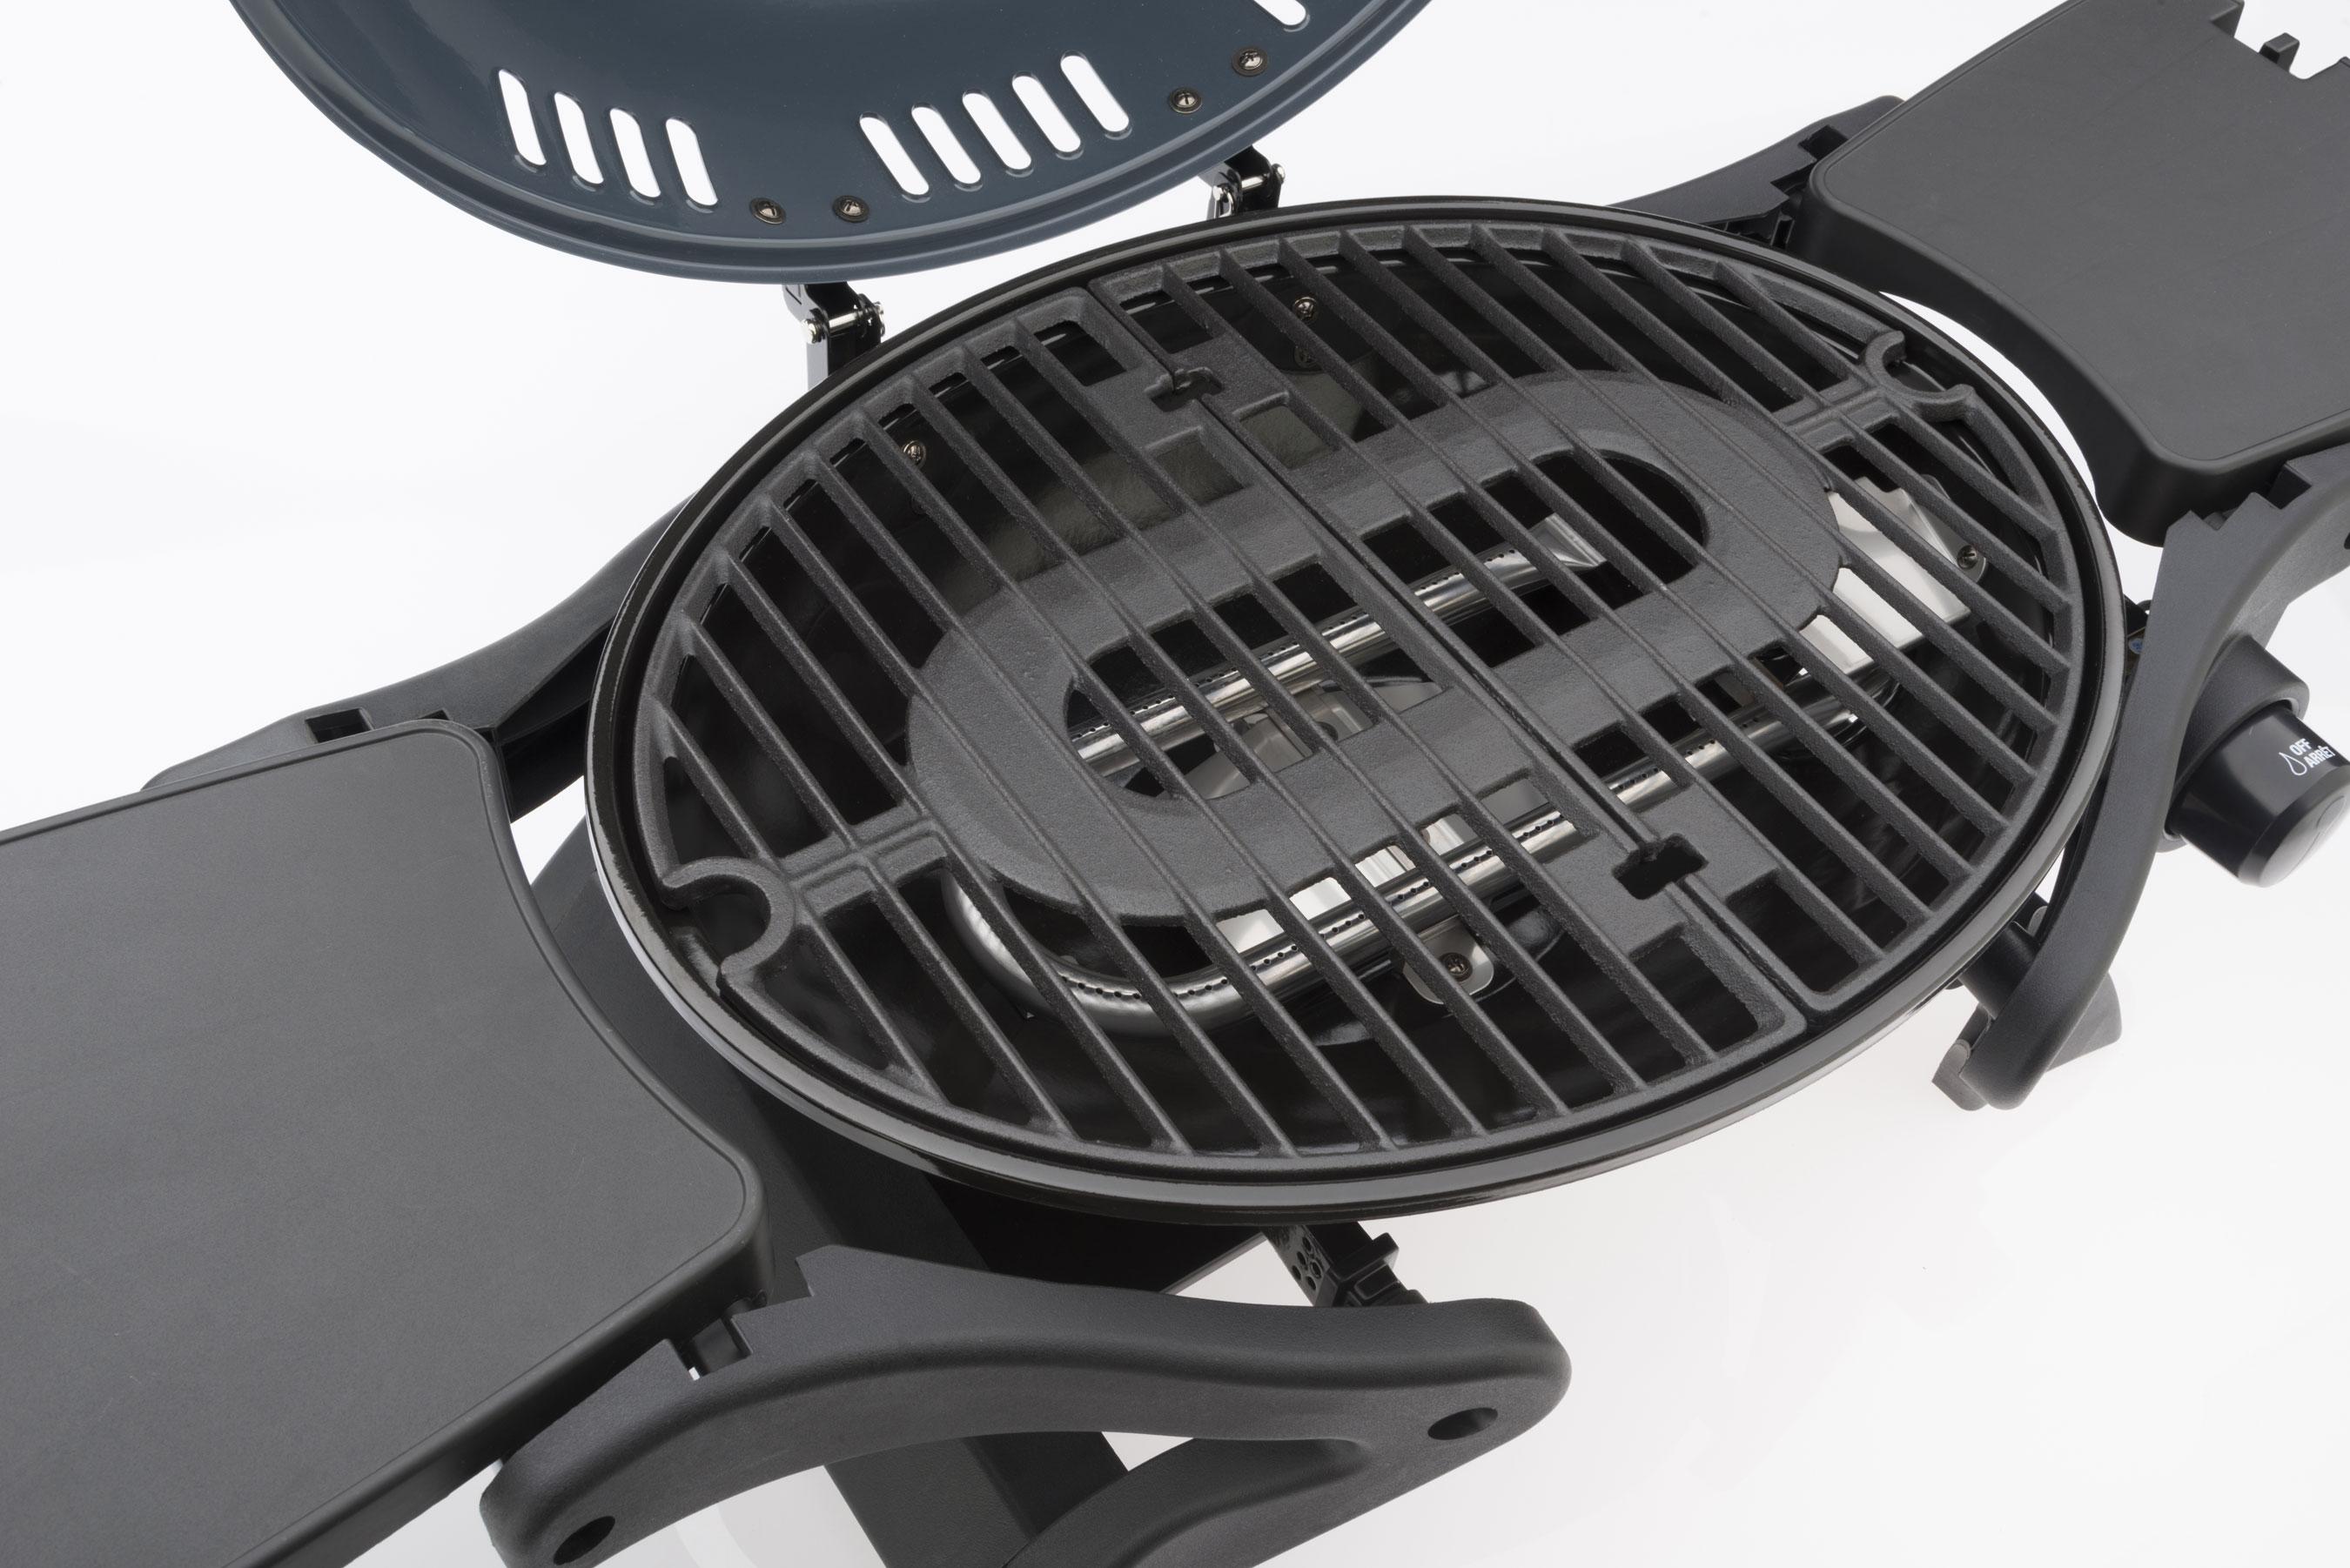 Billig Cadac Gasgrill : Grill chef gasgrill kompakt gasgrill grillfläche 47x35 5cm 12058